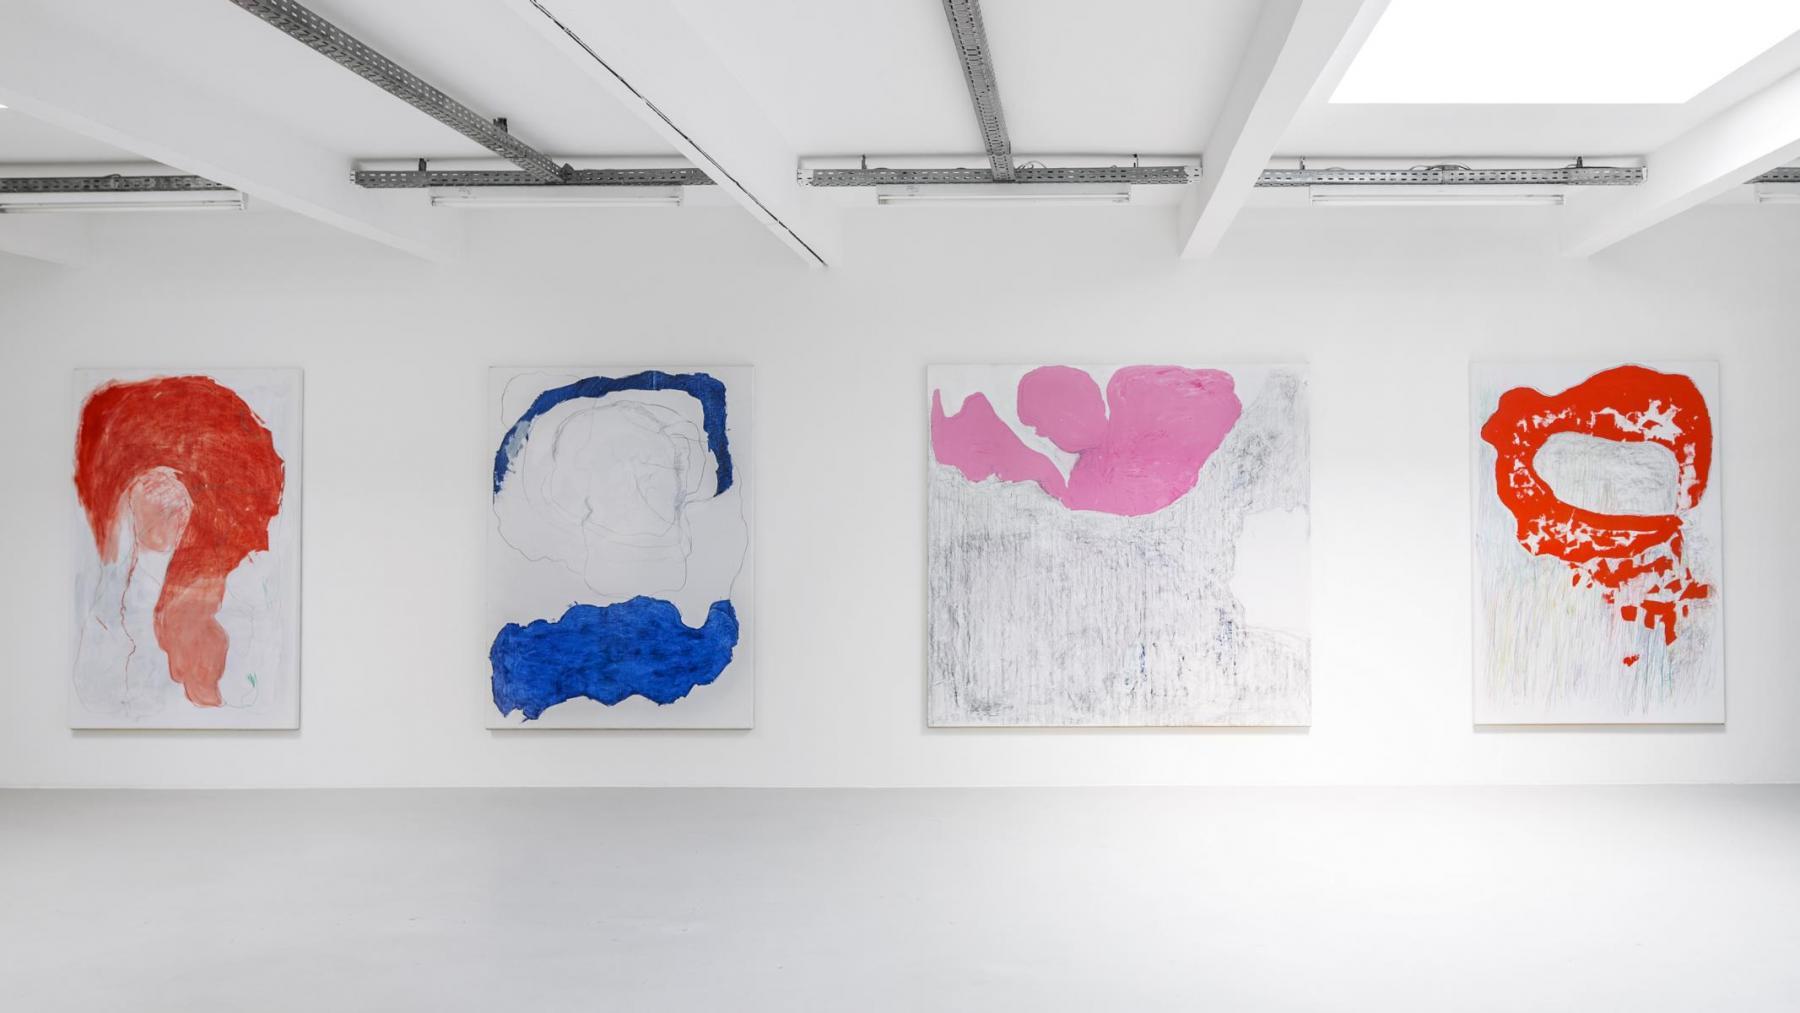 K1600_Mosny_Gonn_2017_Ausstellungsansicht_Verena_Nagl_05